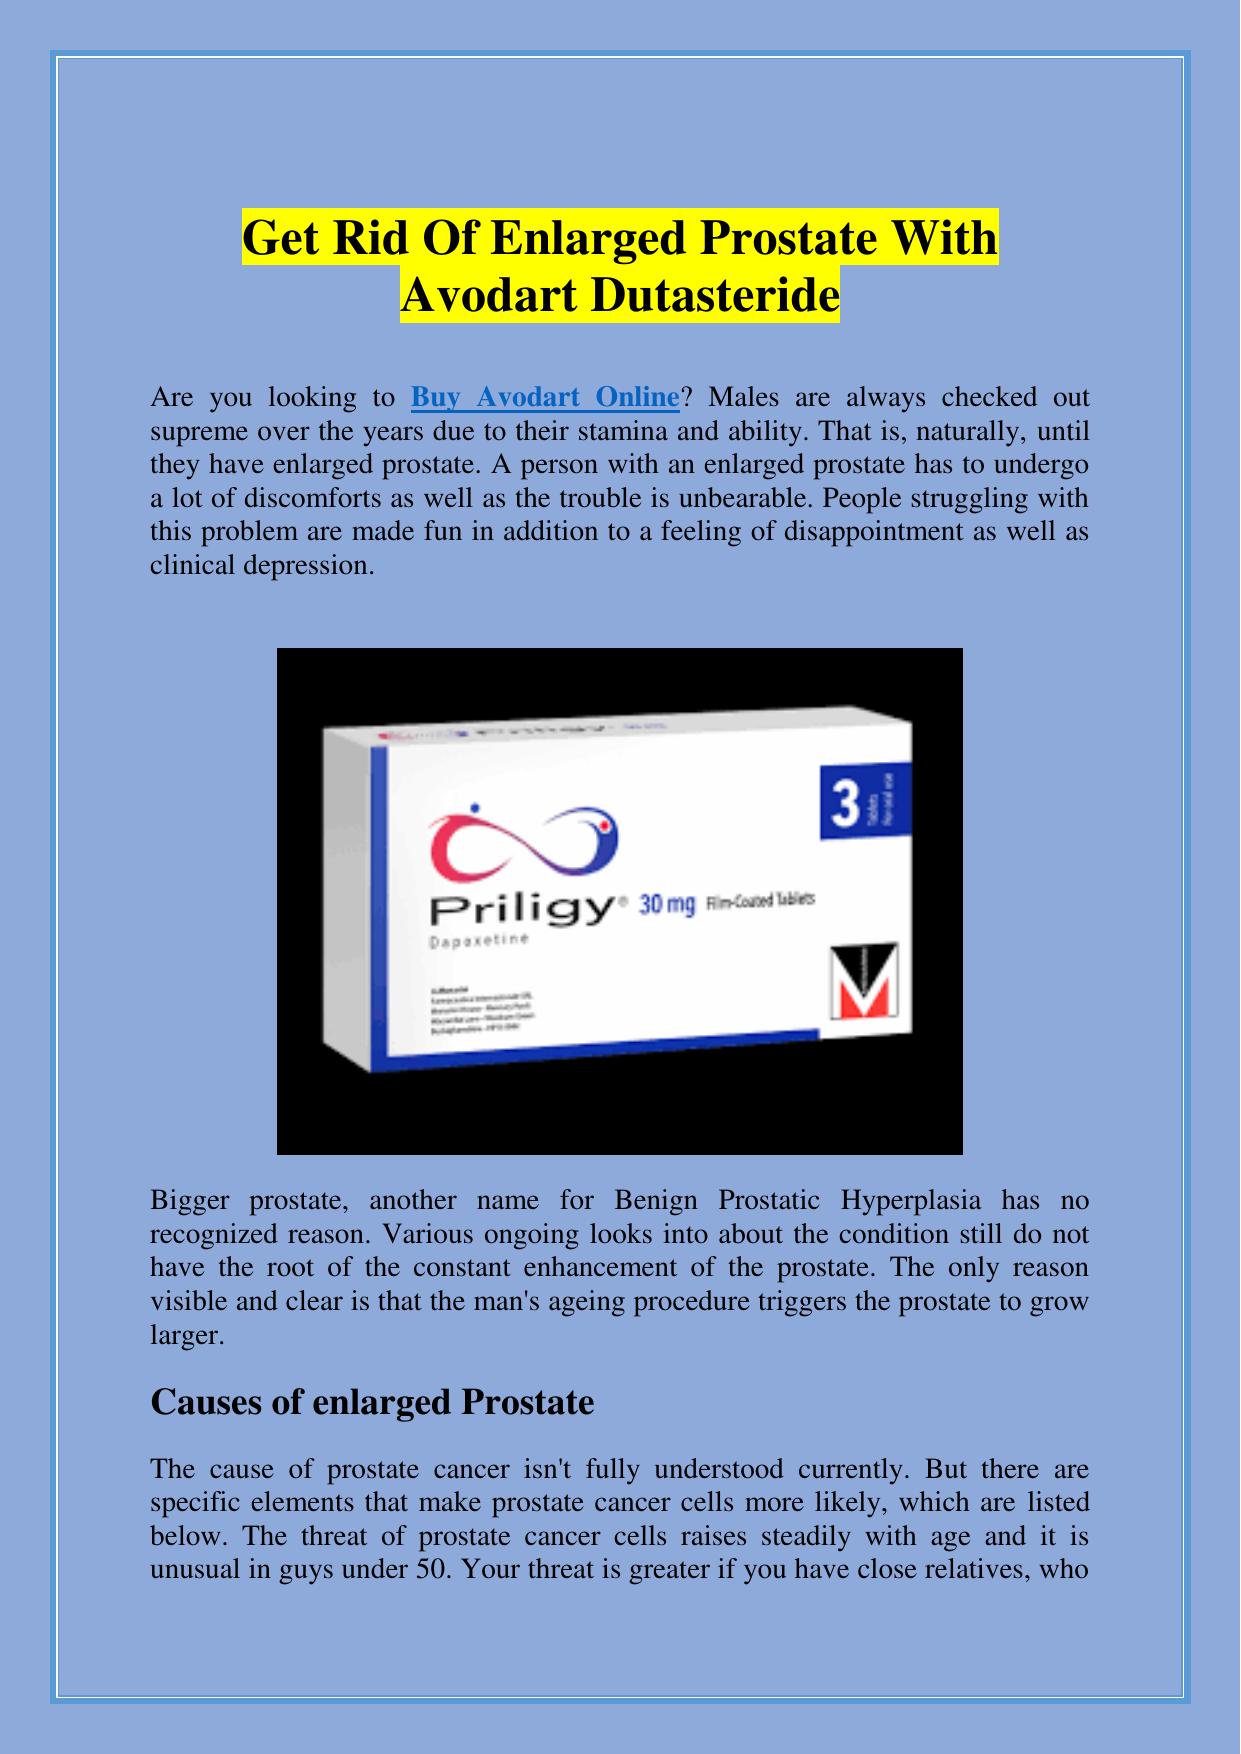 Get Rid Of Enlarged Prostate With Avodart Dutasteride